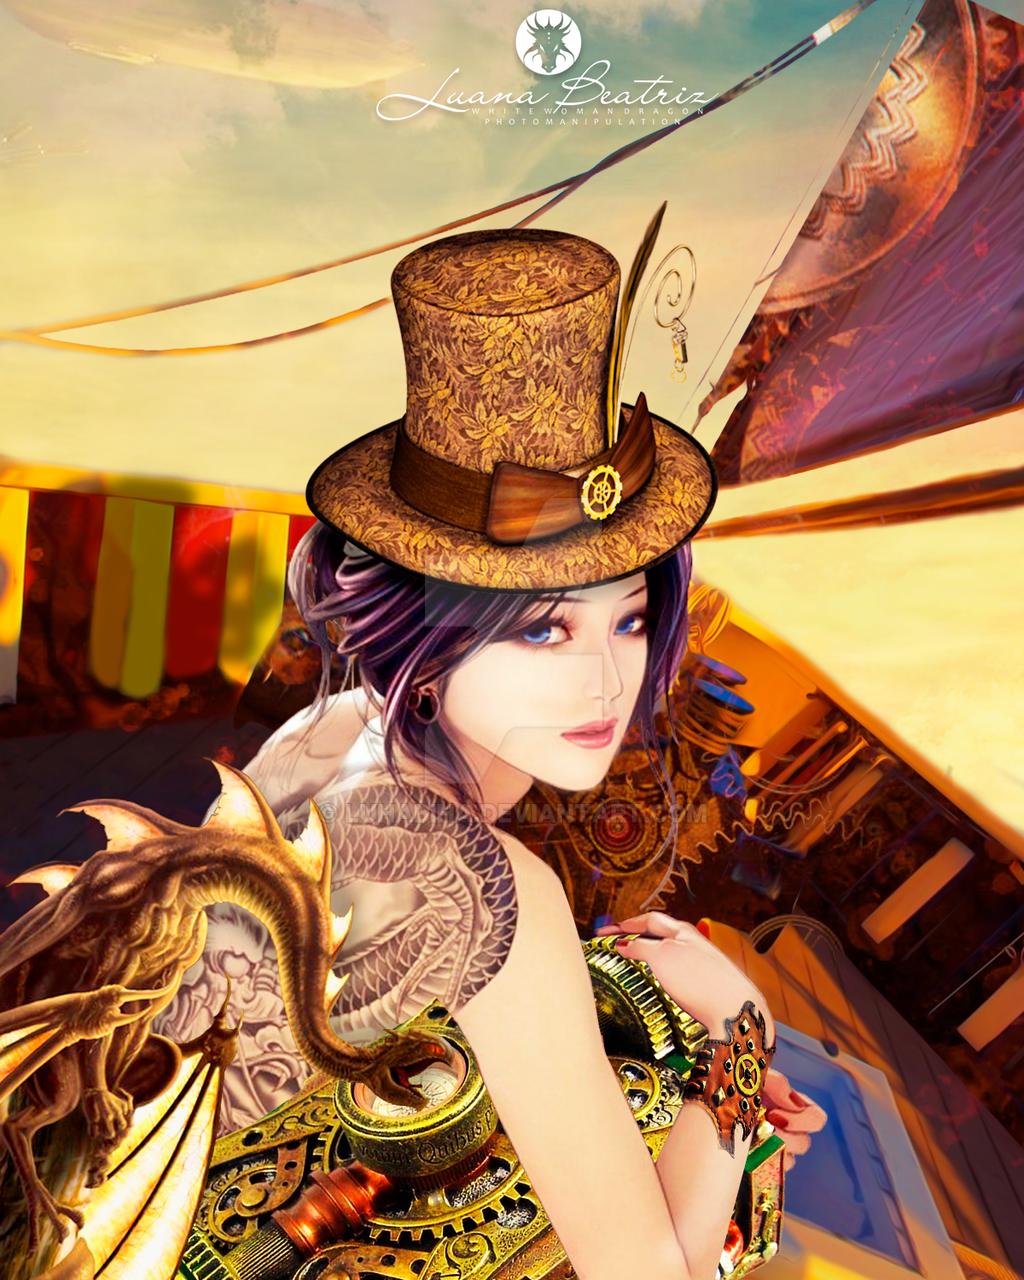 steampunk flying in a flying ship by LuhaBiha